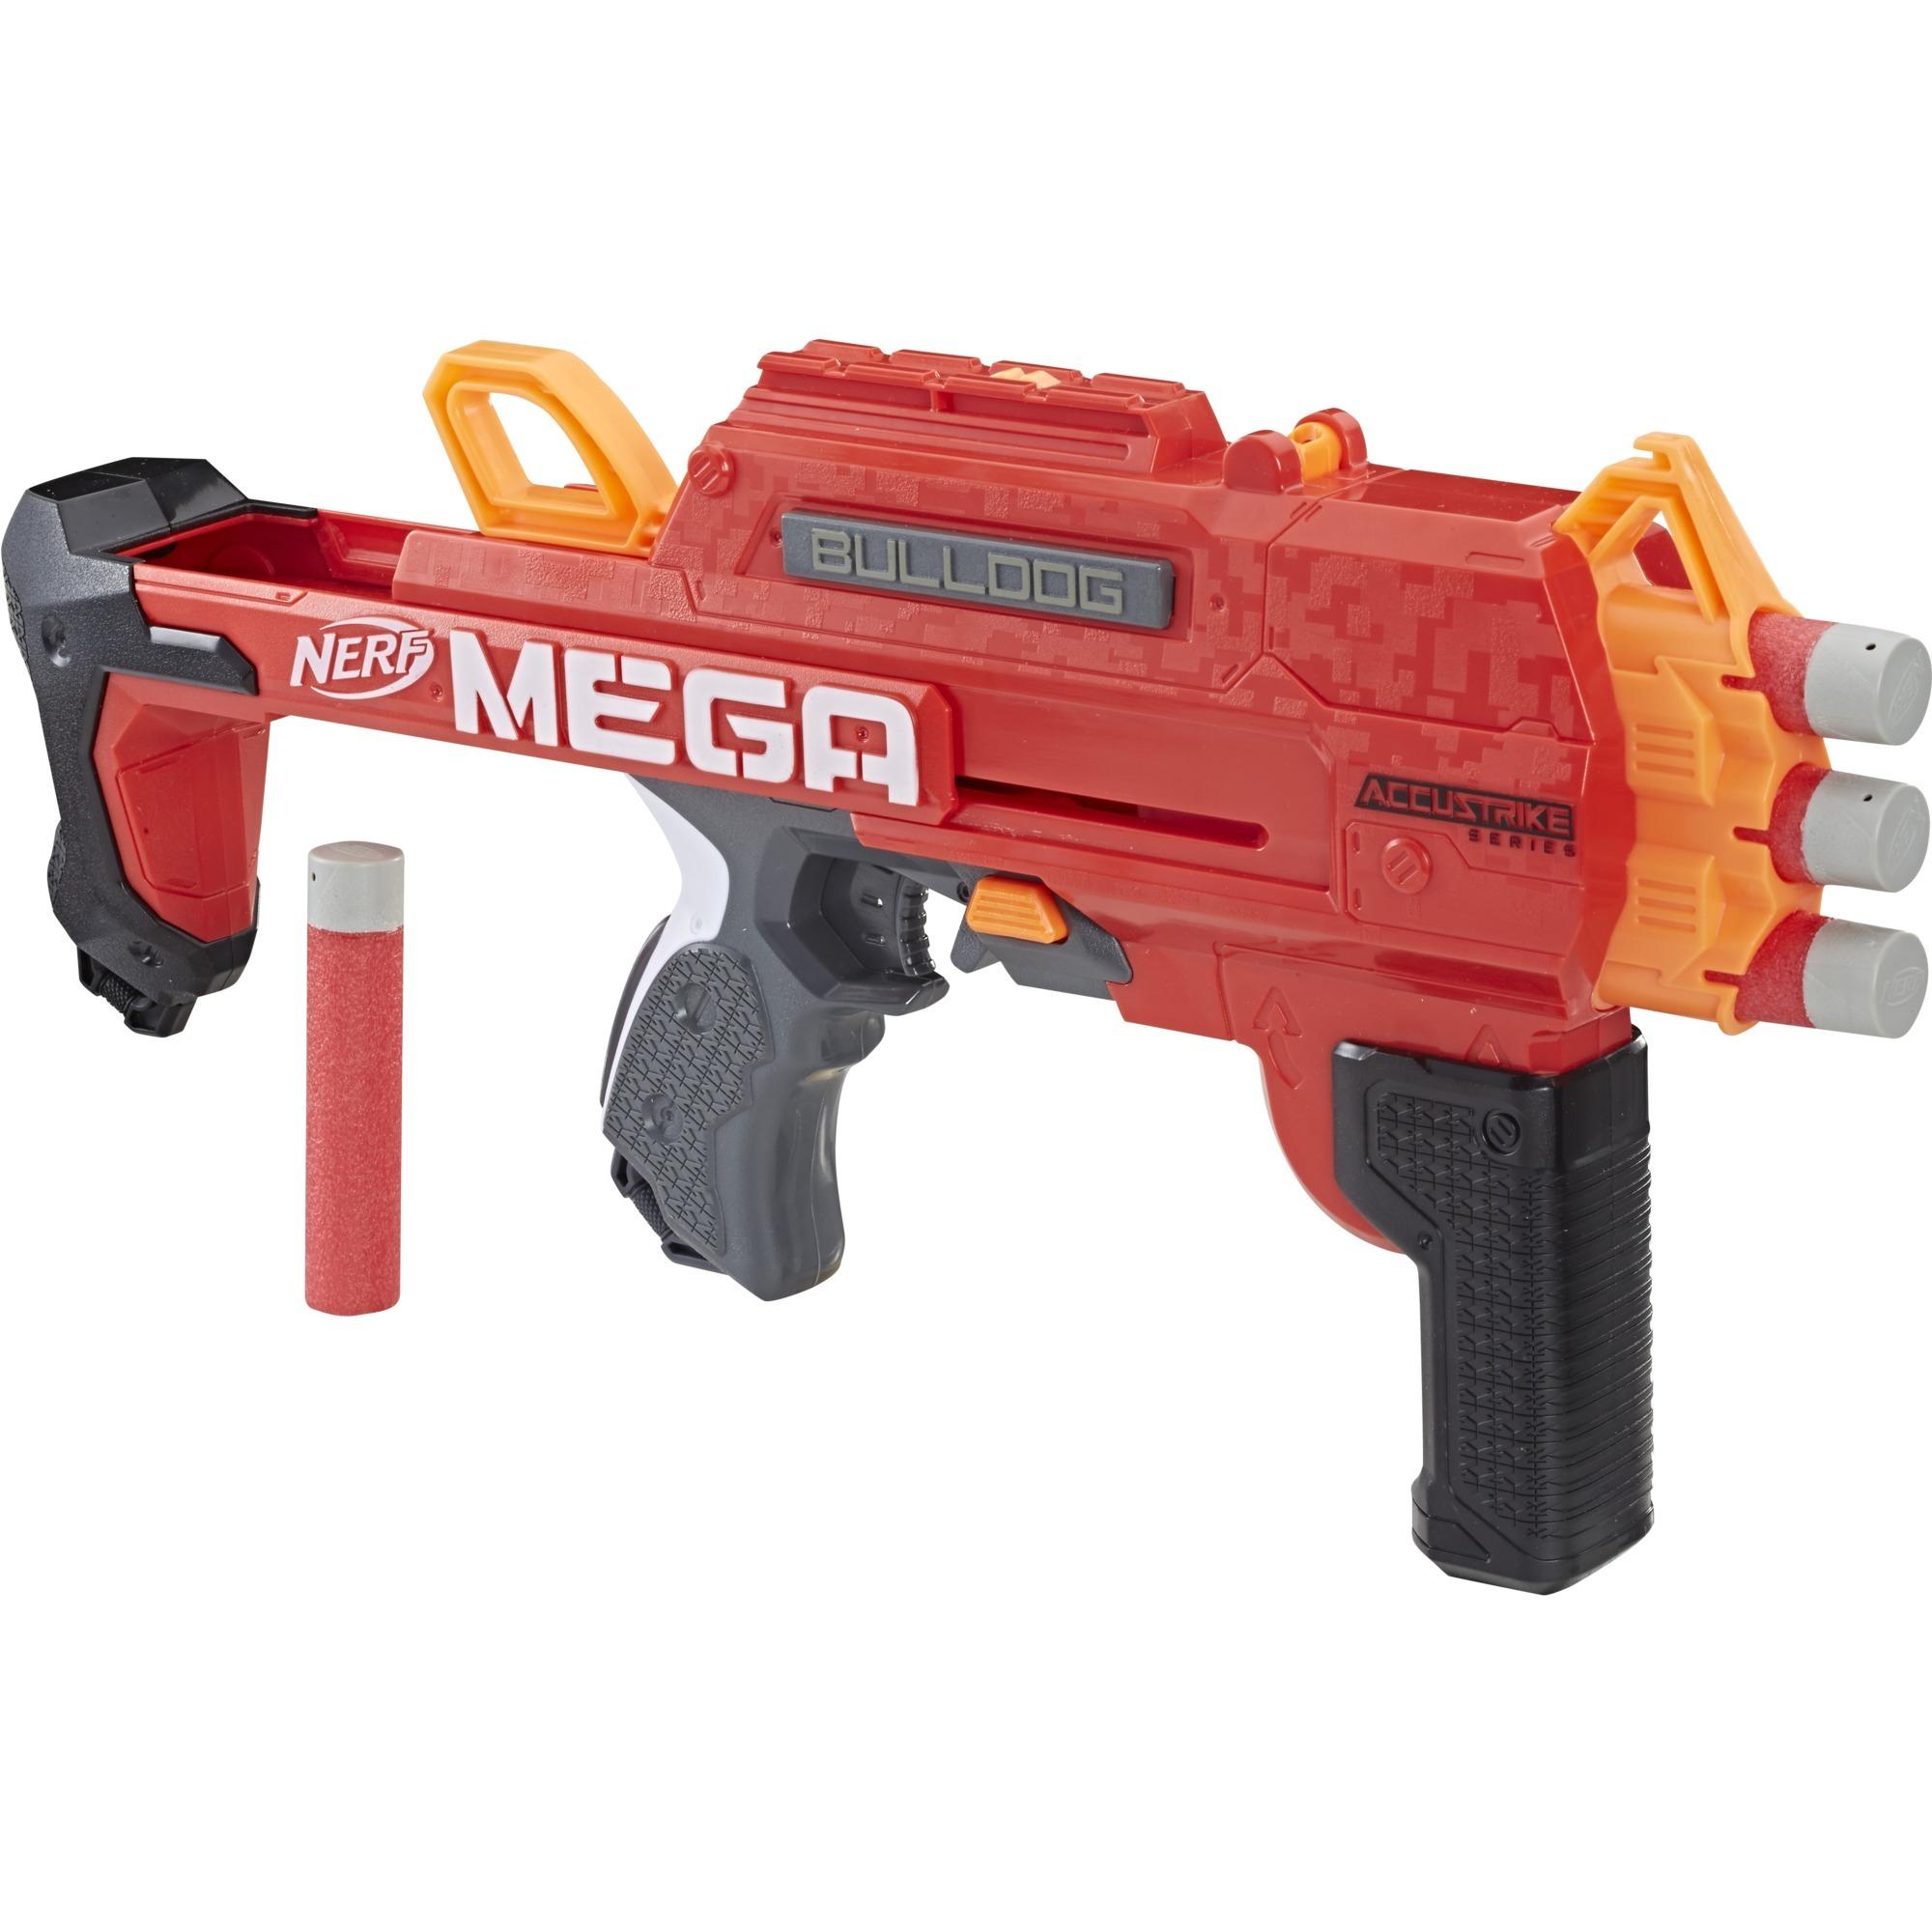 AccuStrike Mega Bulldog, Pistola Nerf